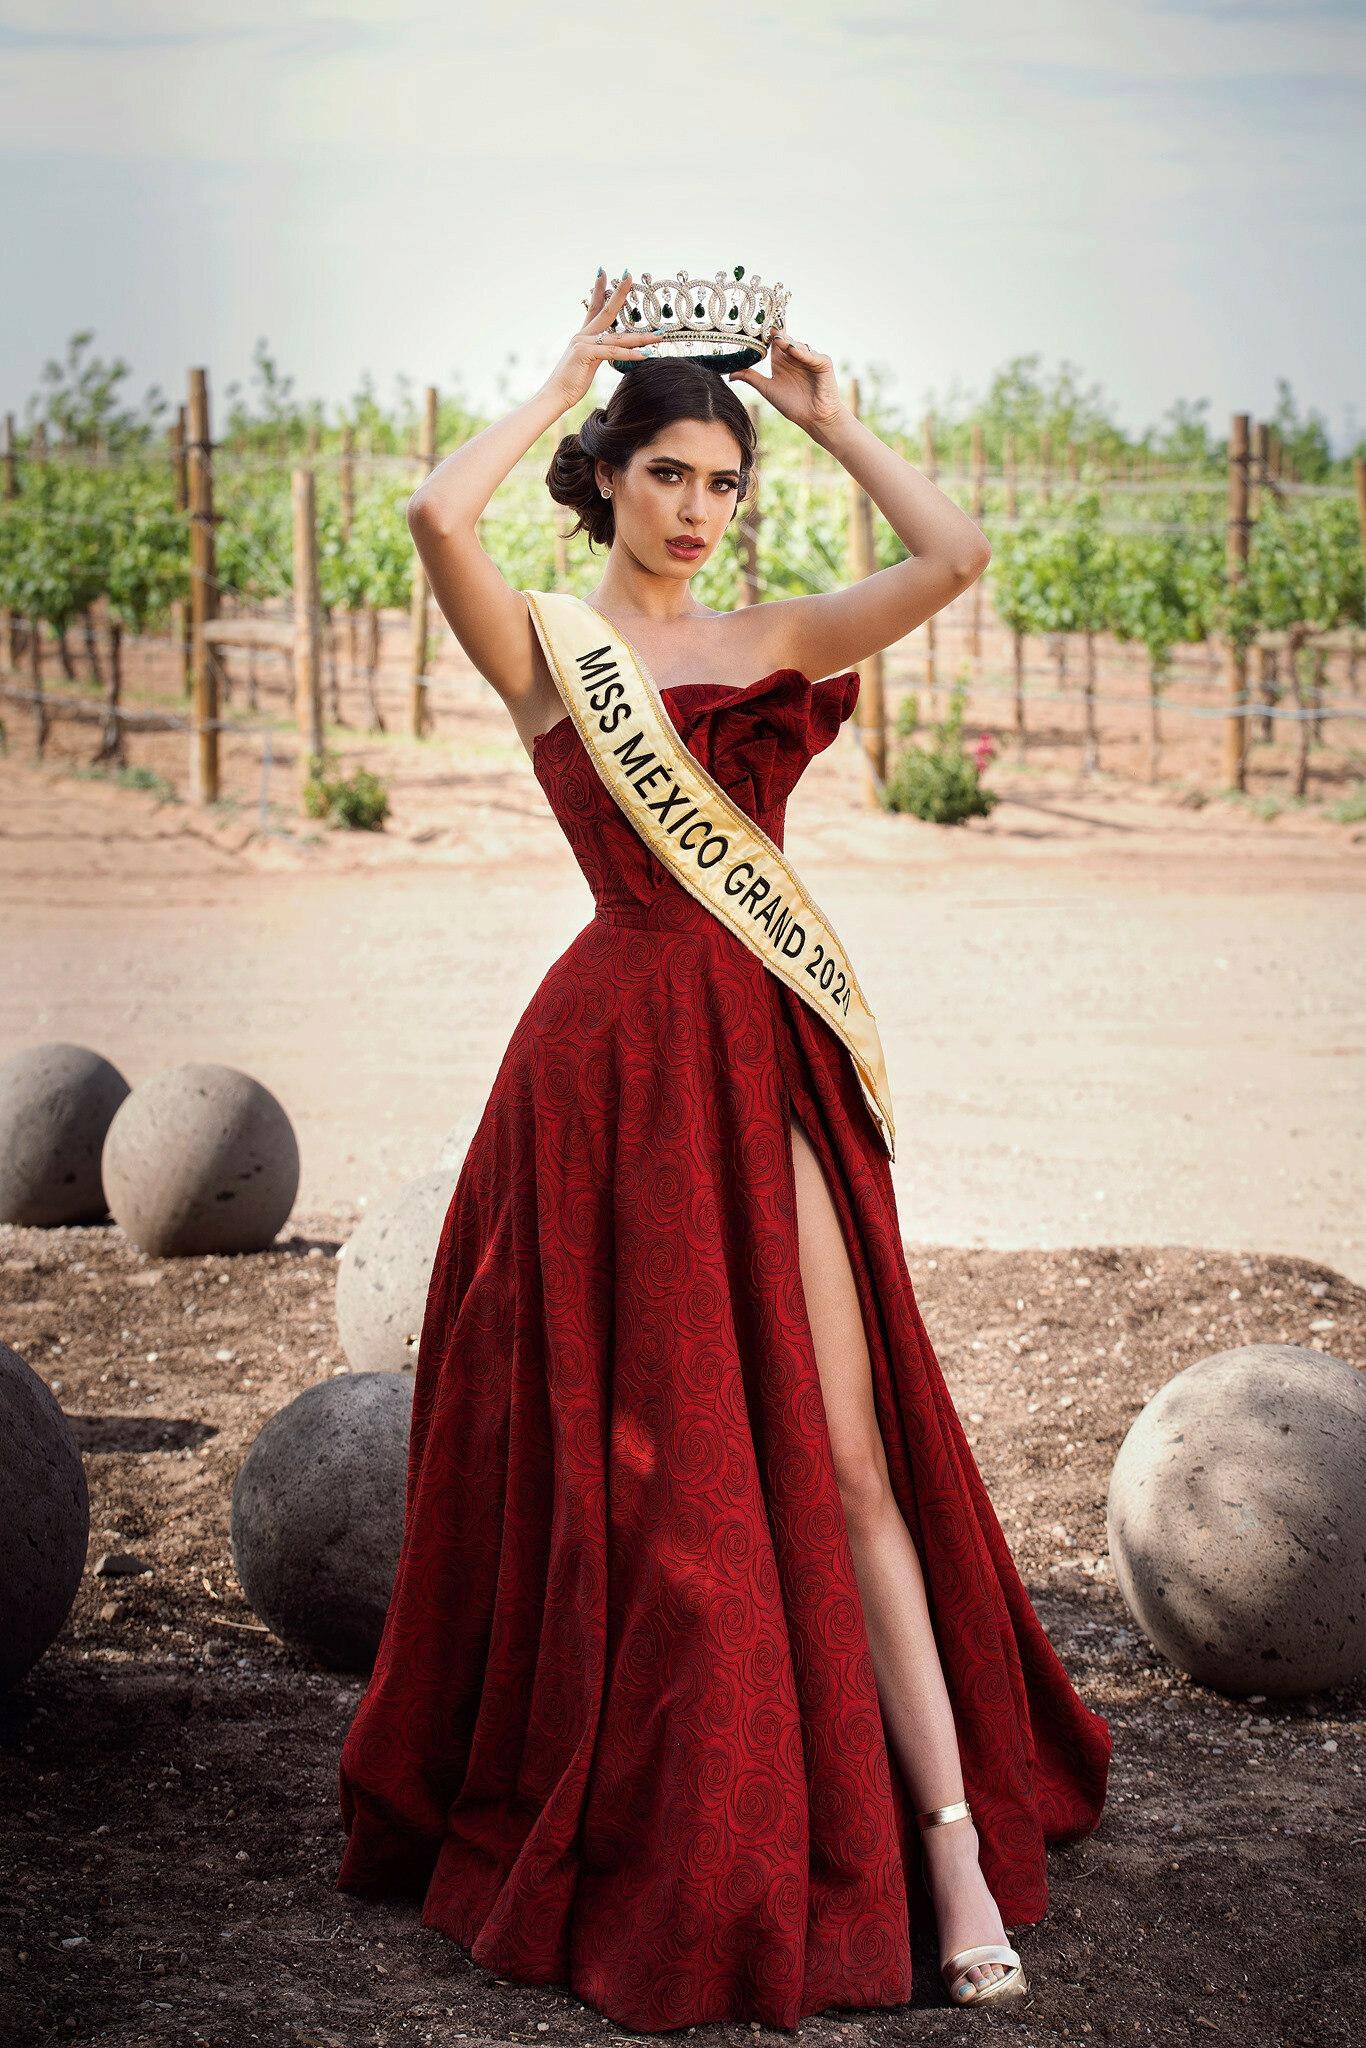 angela leon yuriar, top 21 de miss grand international 2020. - Página 32 Nlp7zg10